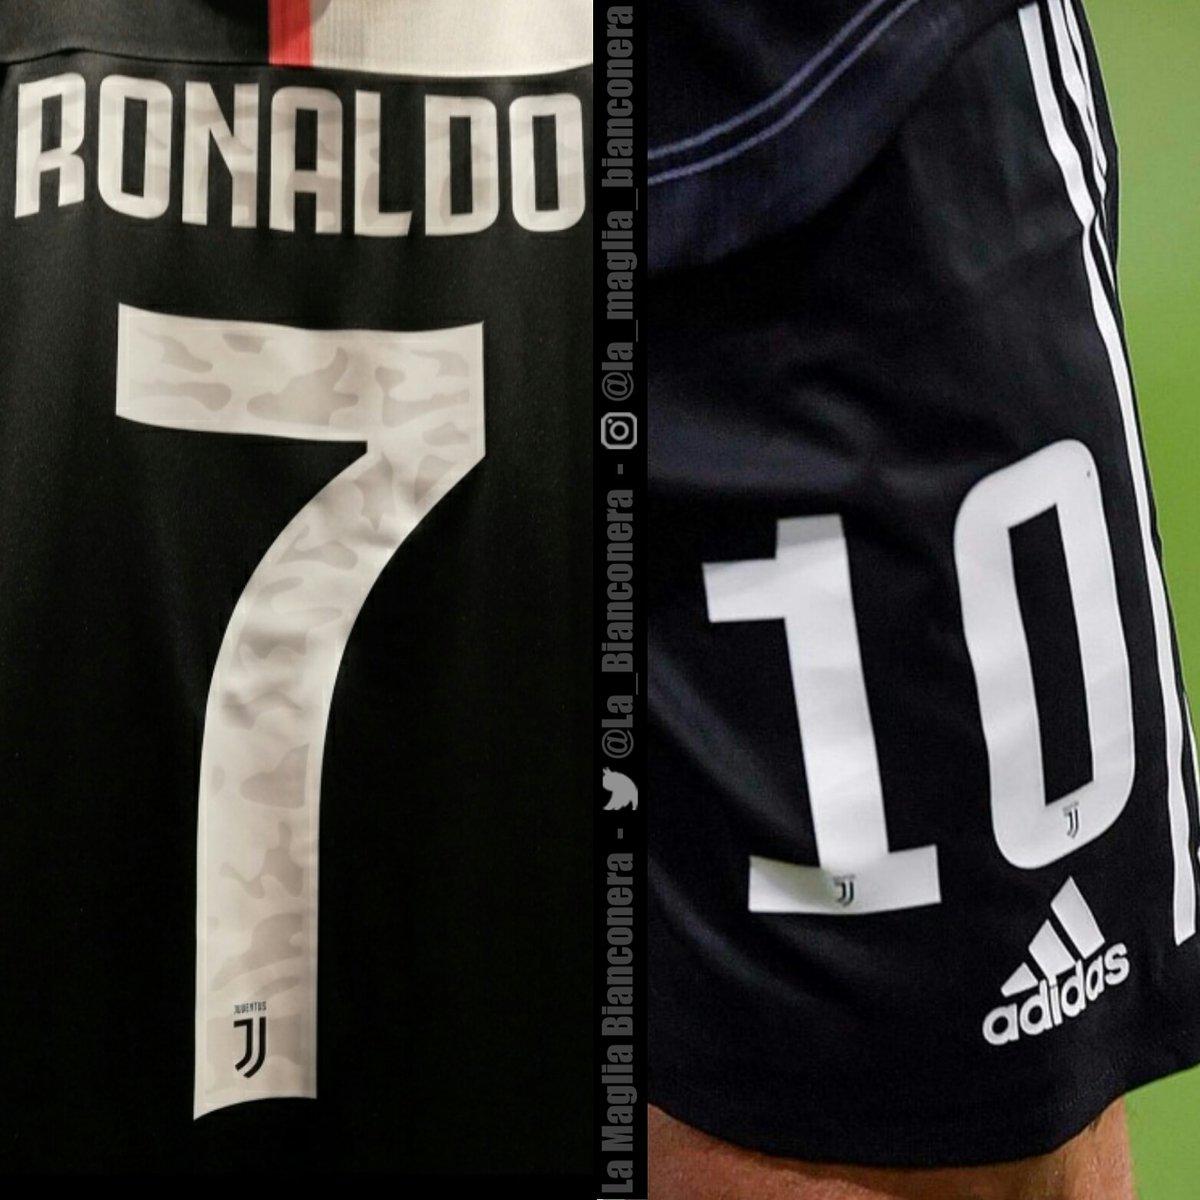 new concept 9c543 155cf Camo Adidas Juventus 19-20 Kit Font Released - Away Kit Leak ...